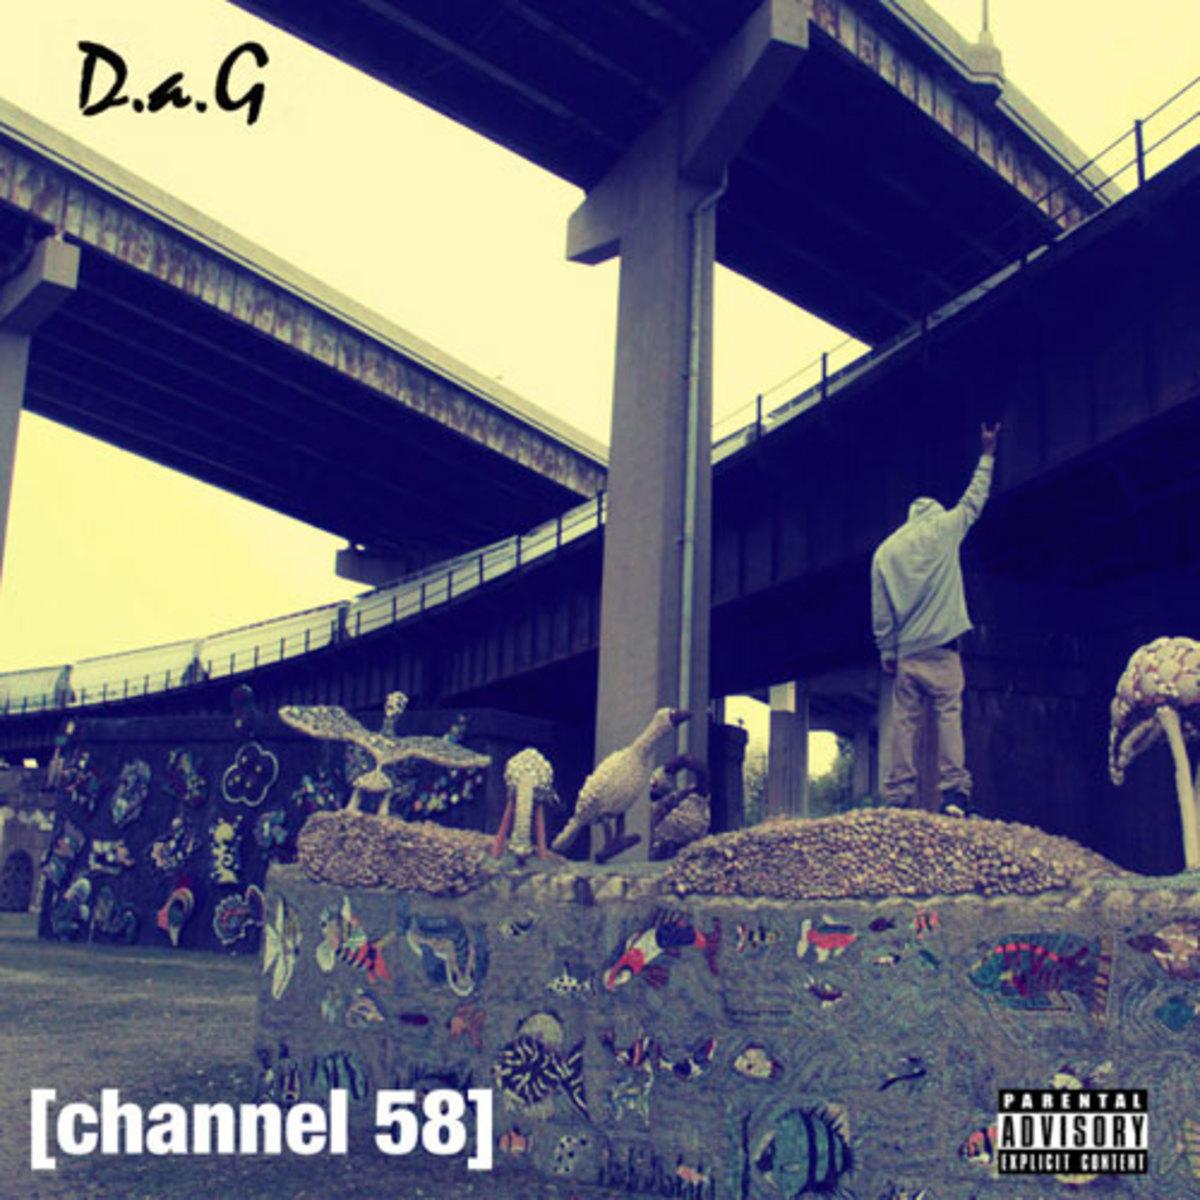 dag-channel58.jpg